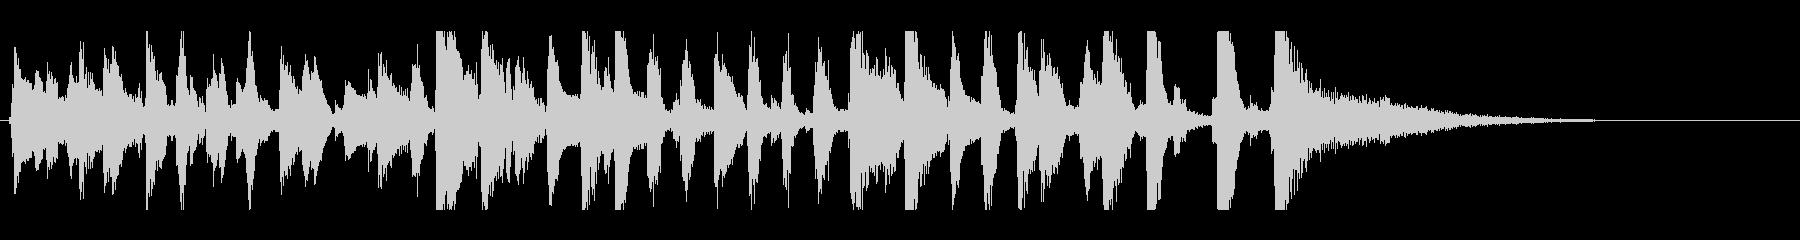 YouTube、明るいピアノレトロジャズの未再生の波形